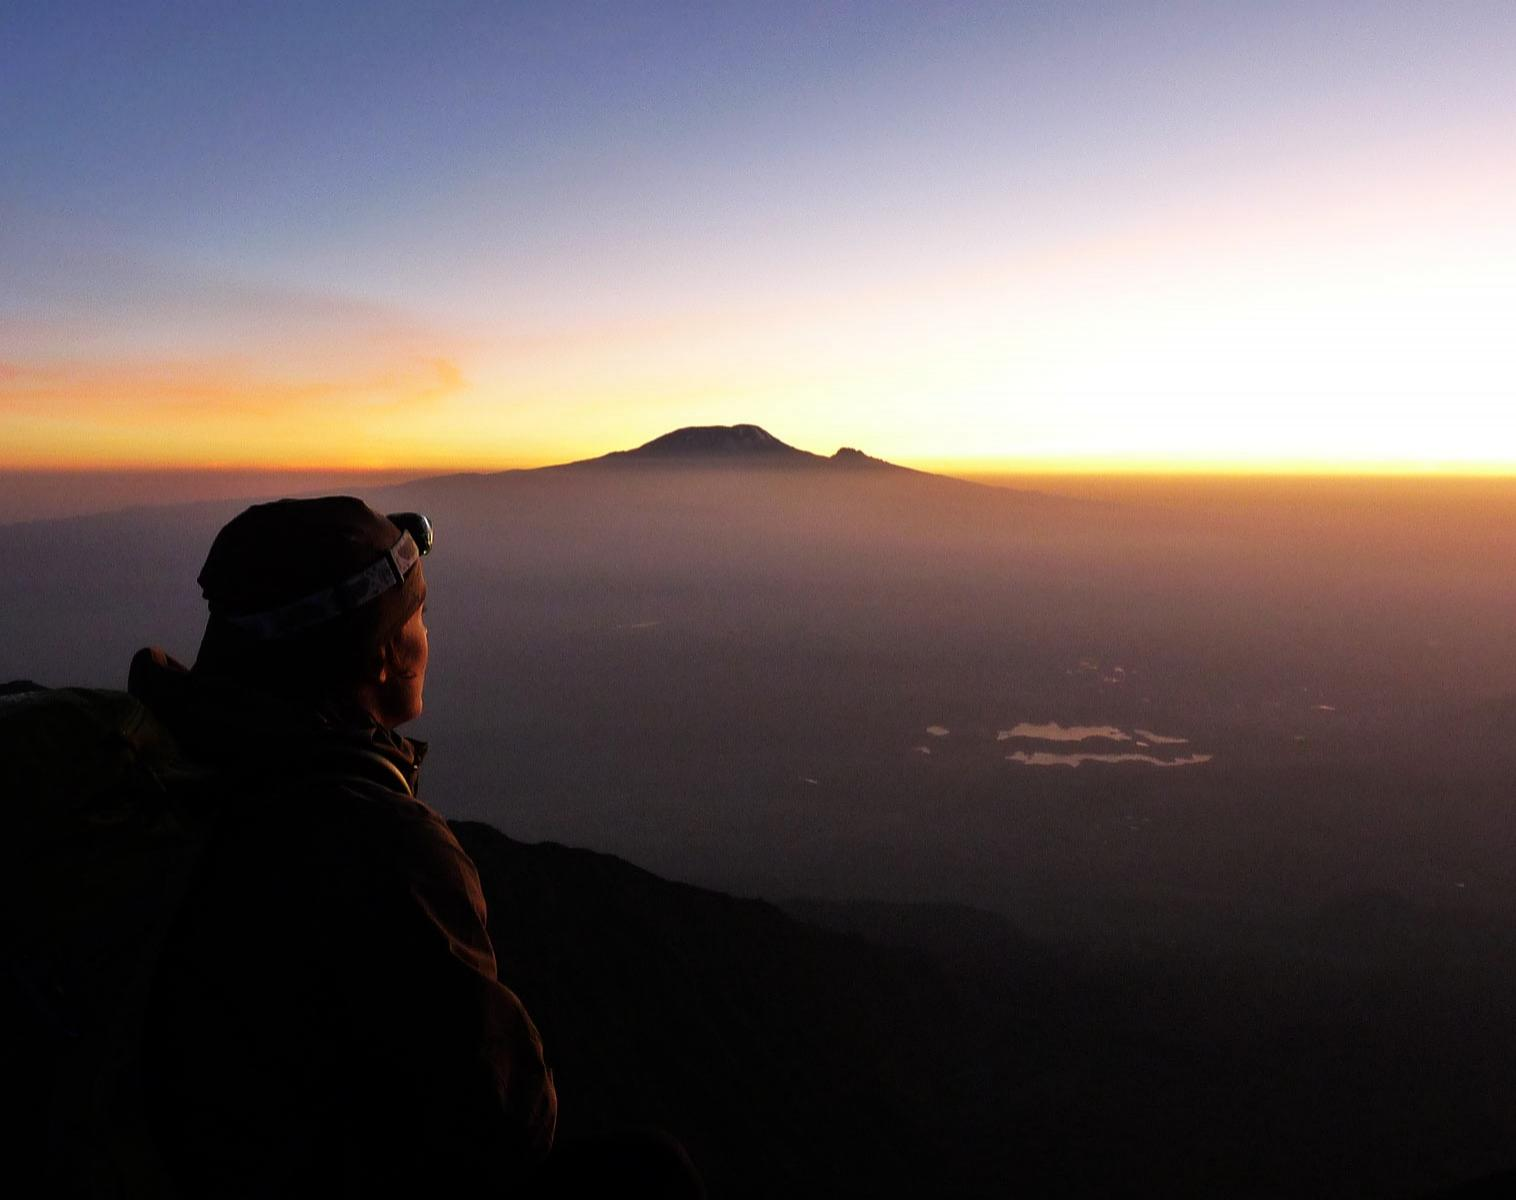 Tanzanie  Meru, les 3 sommets du Kilimandjaro et safari   Trek & Randonnée Safari